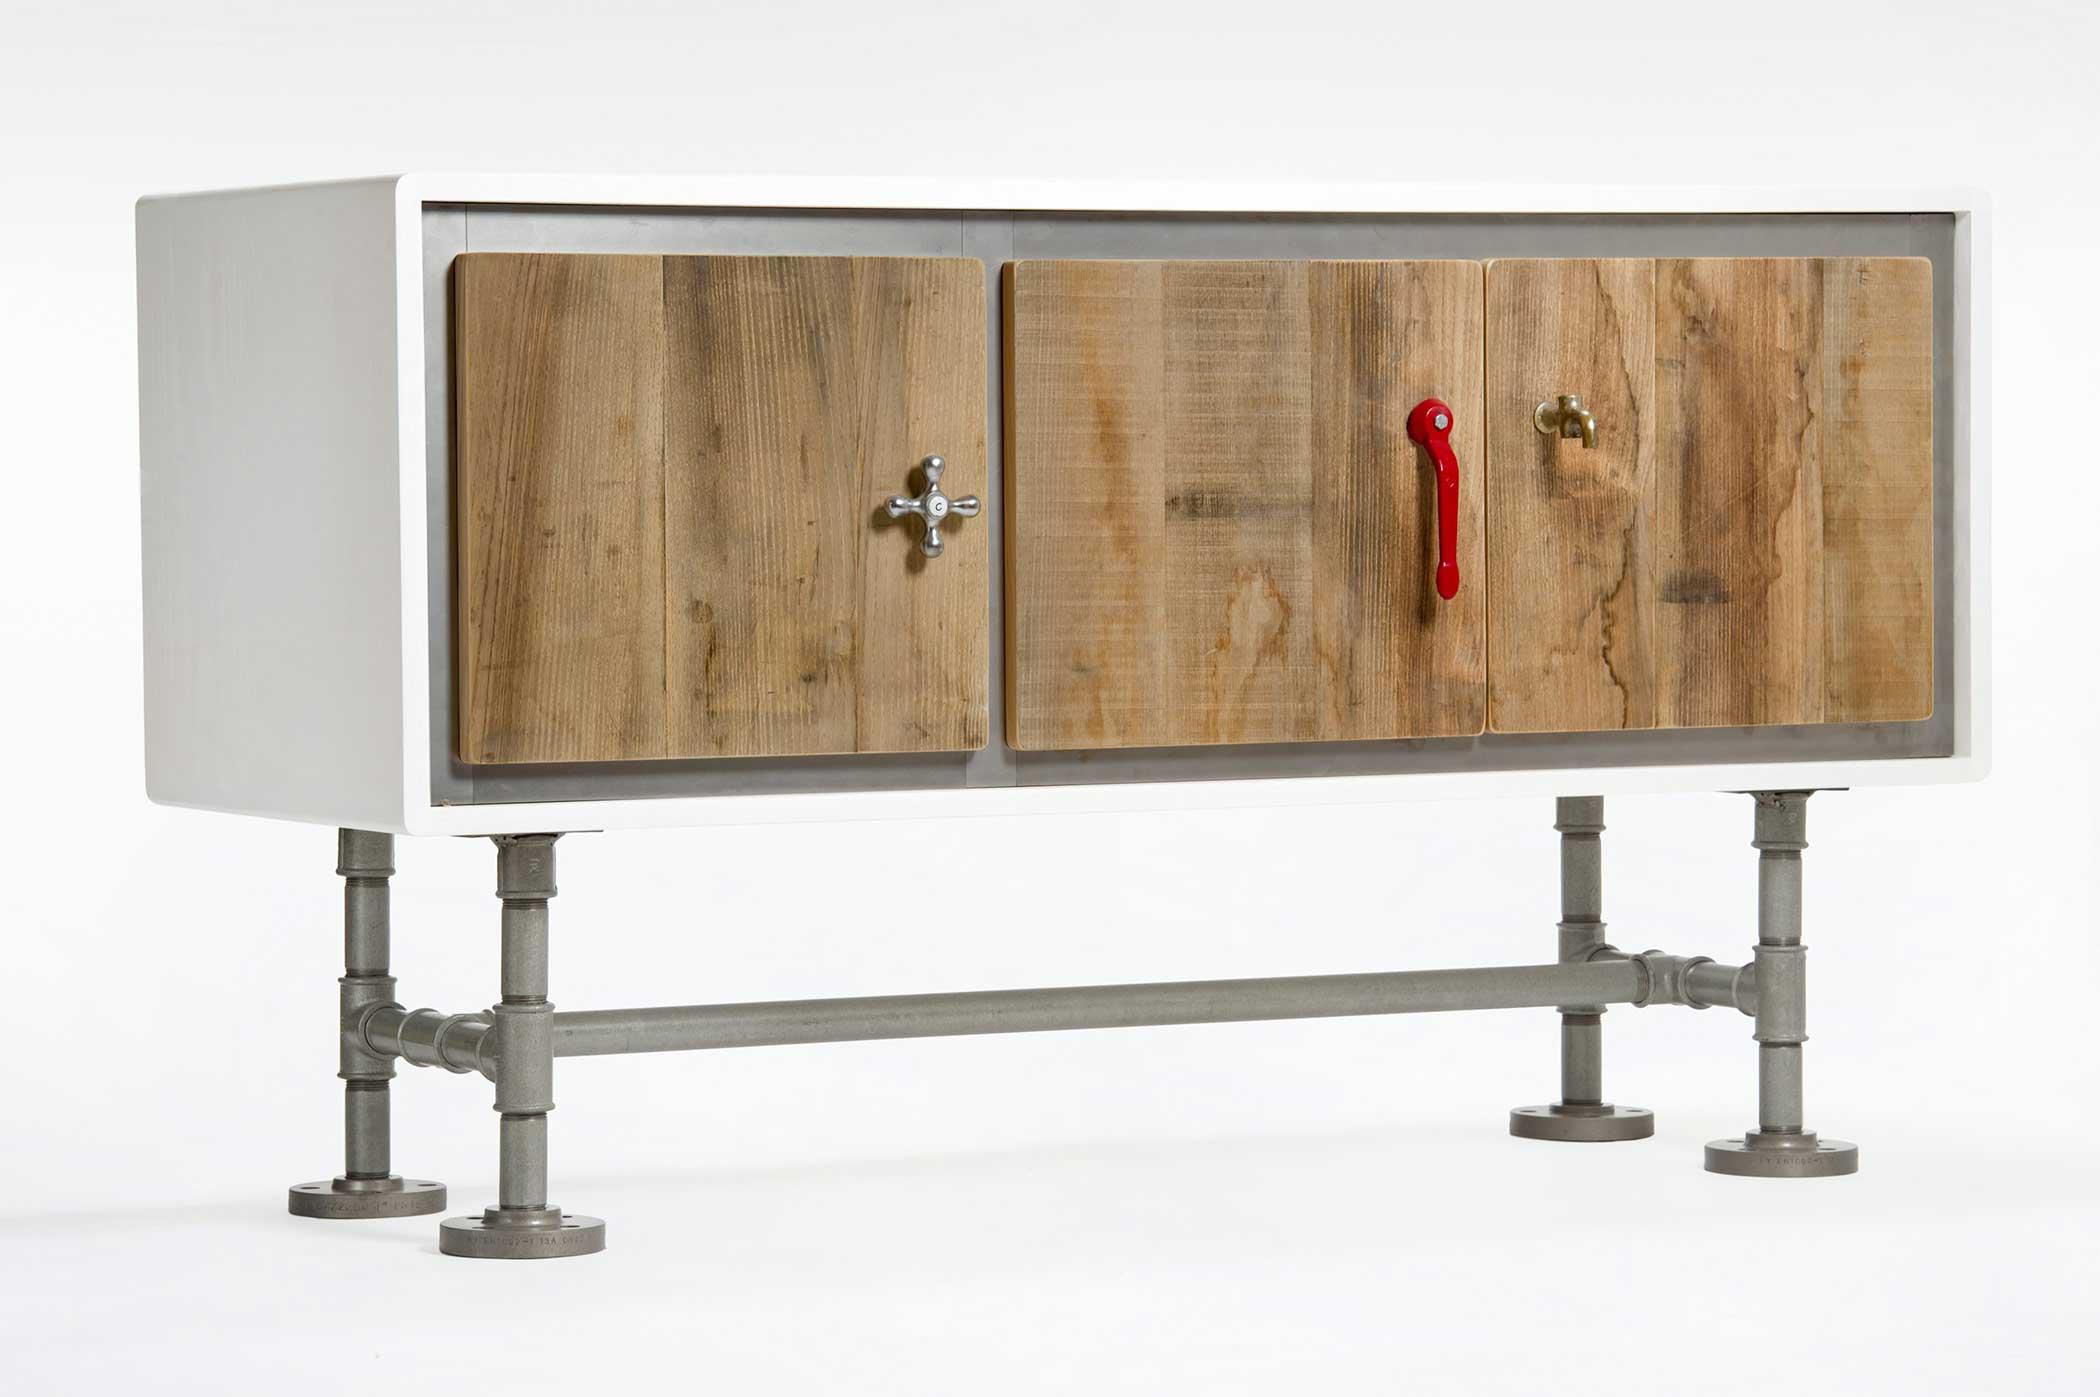 Credenza in stile industriale, struttura laccata bianca, sportelli in legno da costruzione, gambe costruite con tubi idraulici. Maniglie oggetti idraulici.